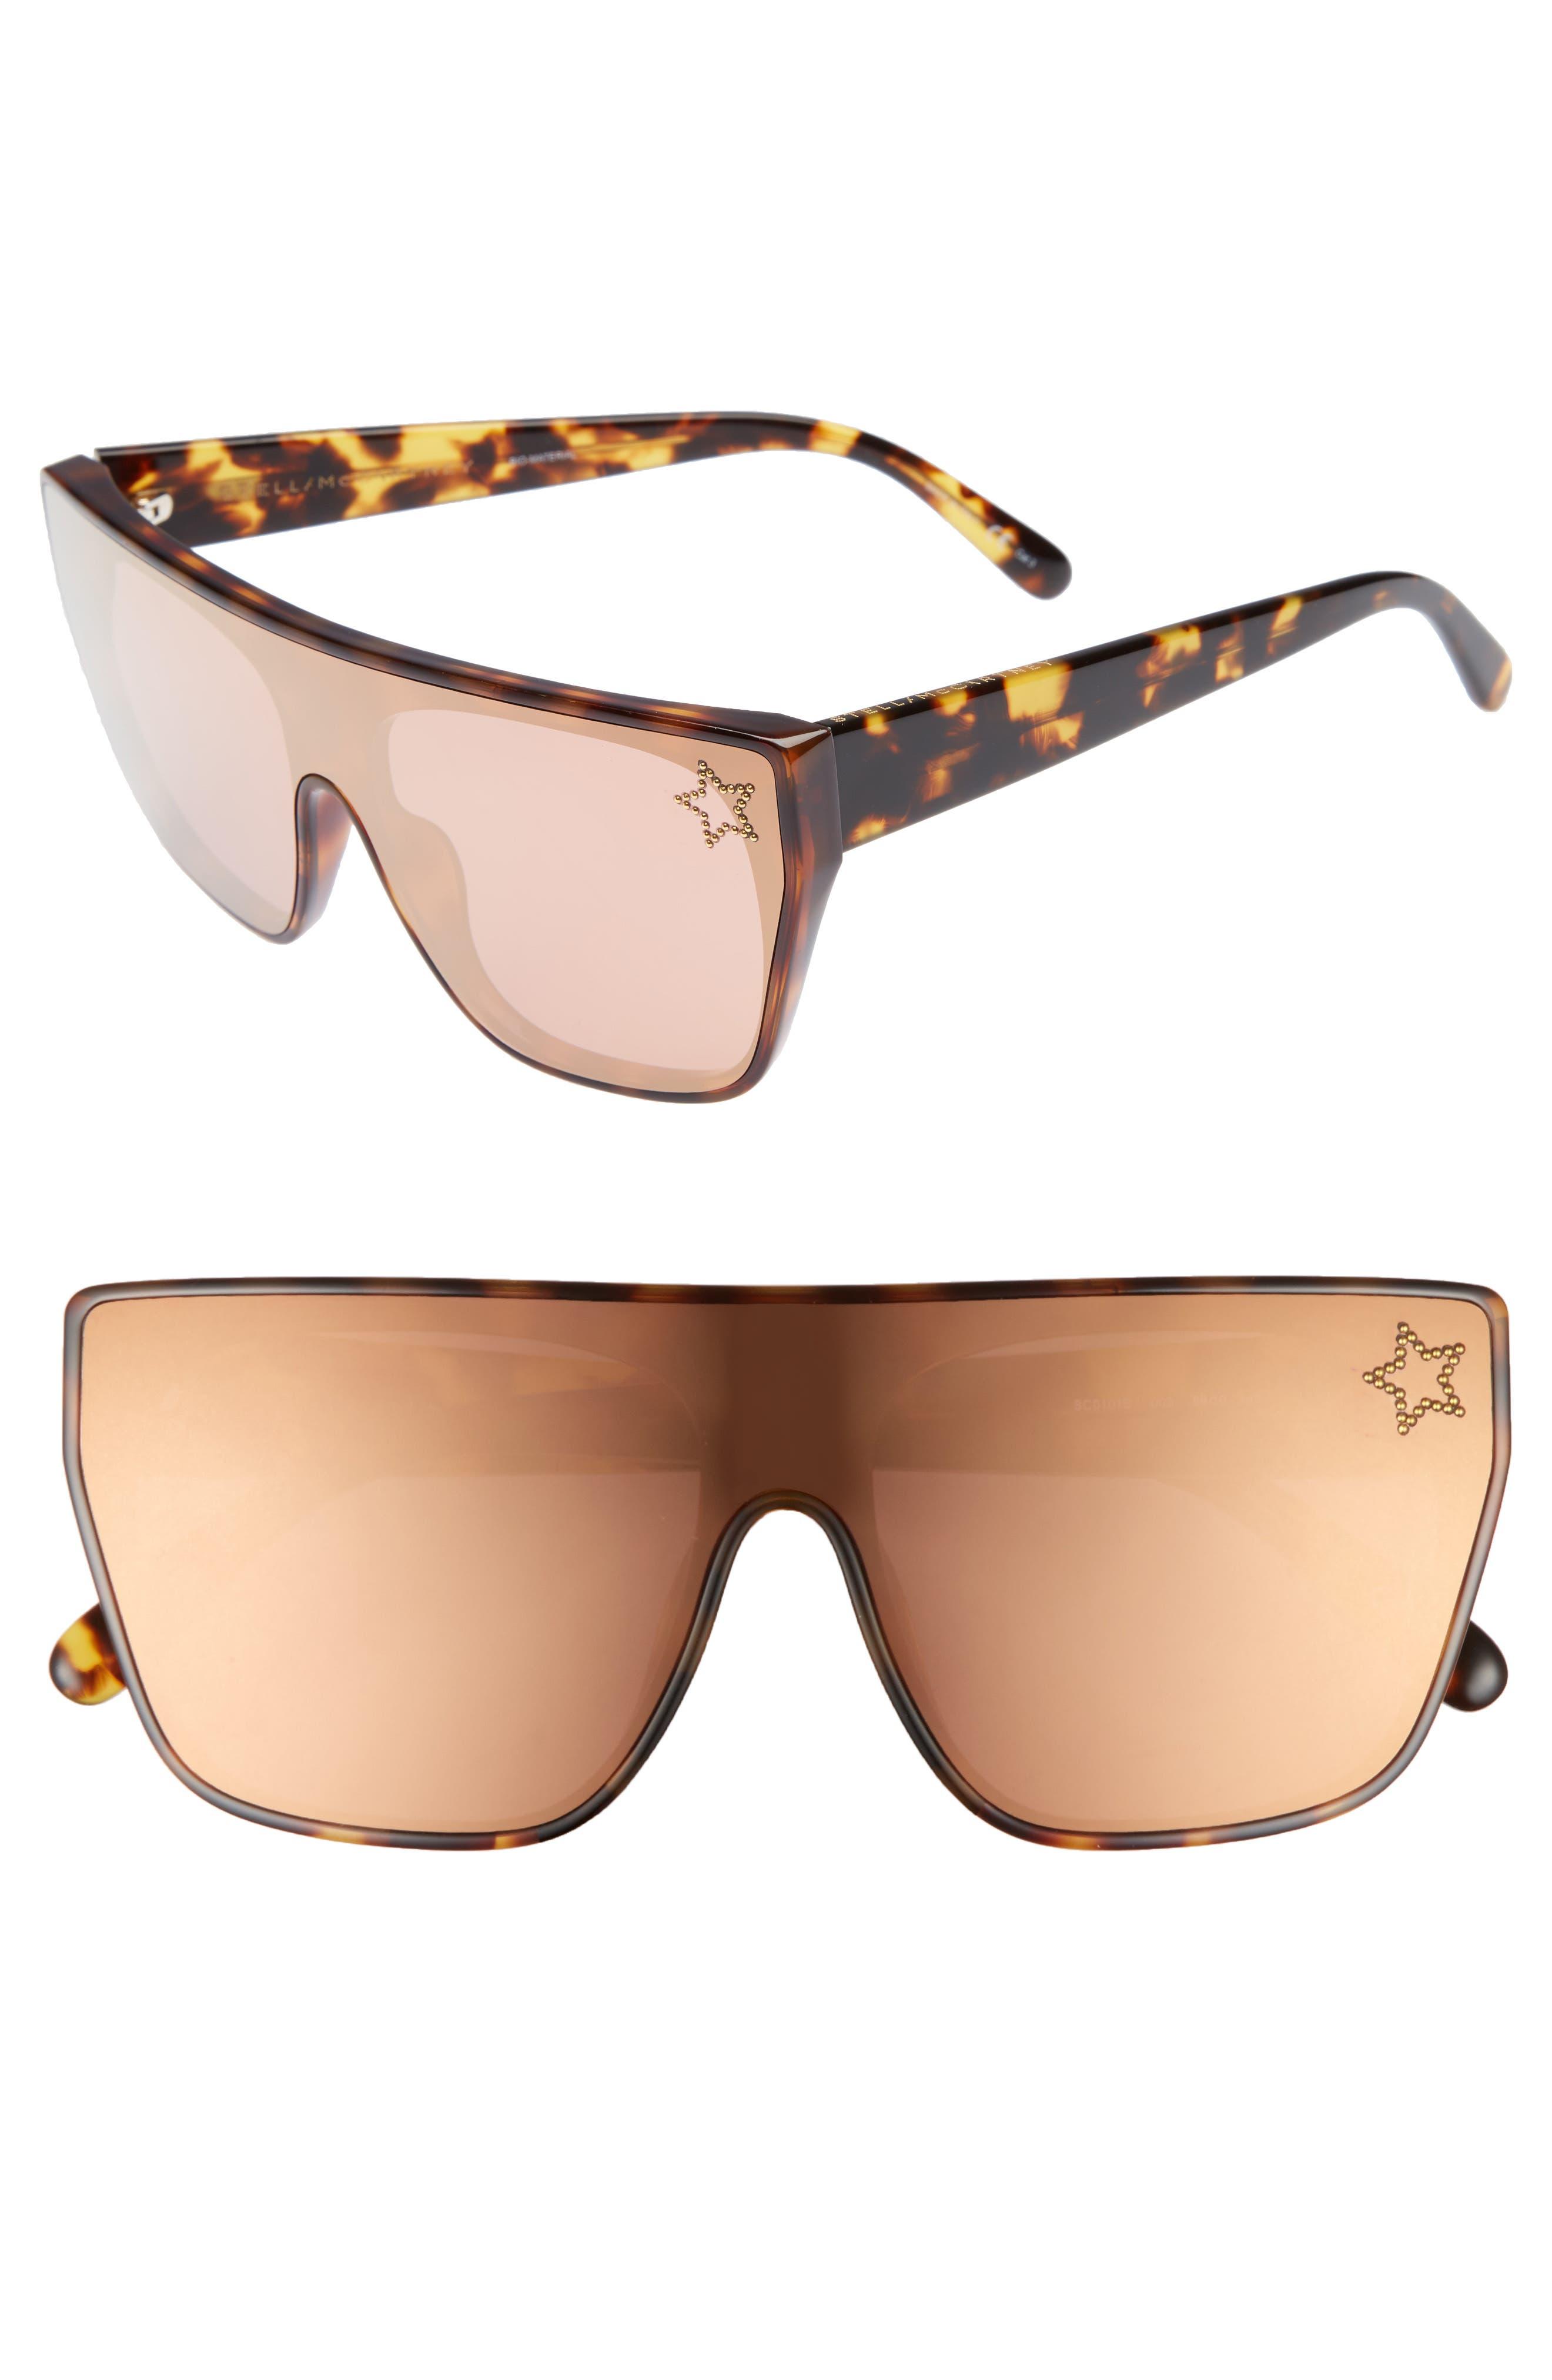 99mm Flat Top Sunglasses,                         Main,                         color, Blonde Avana